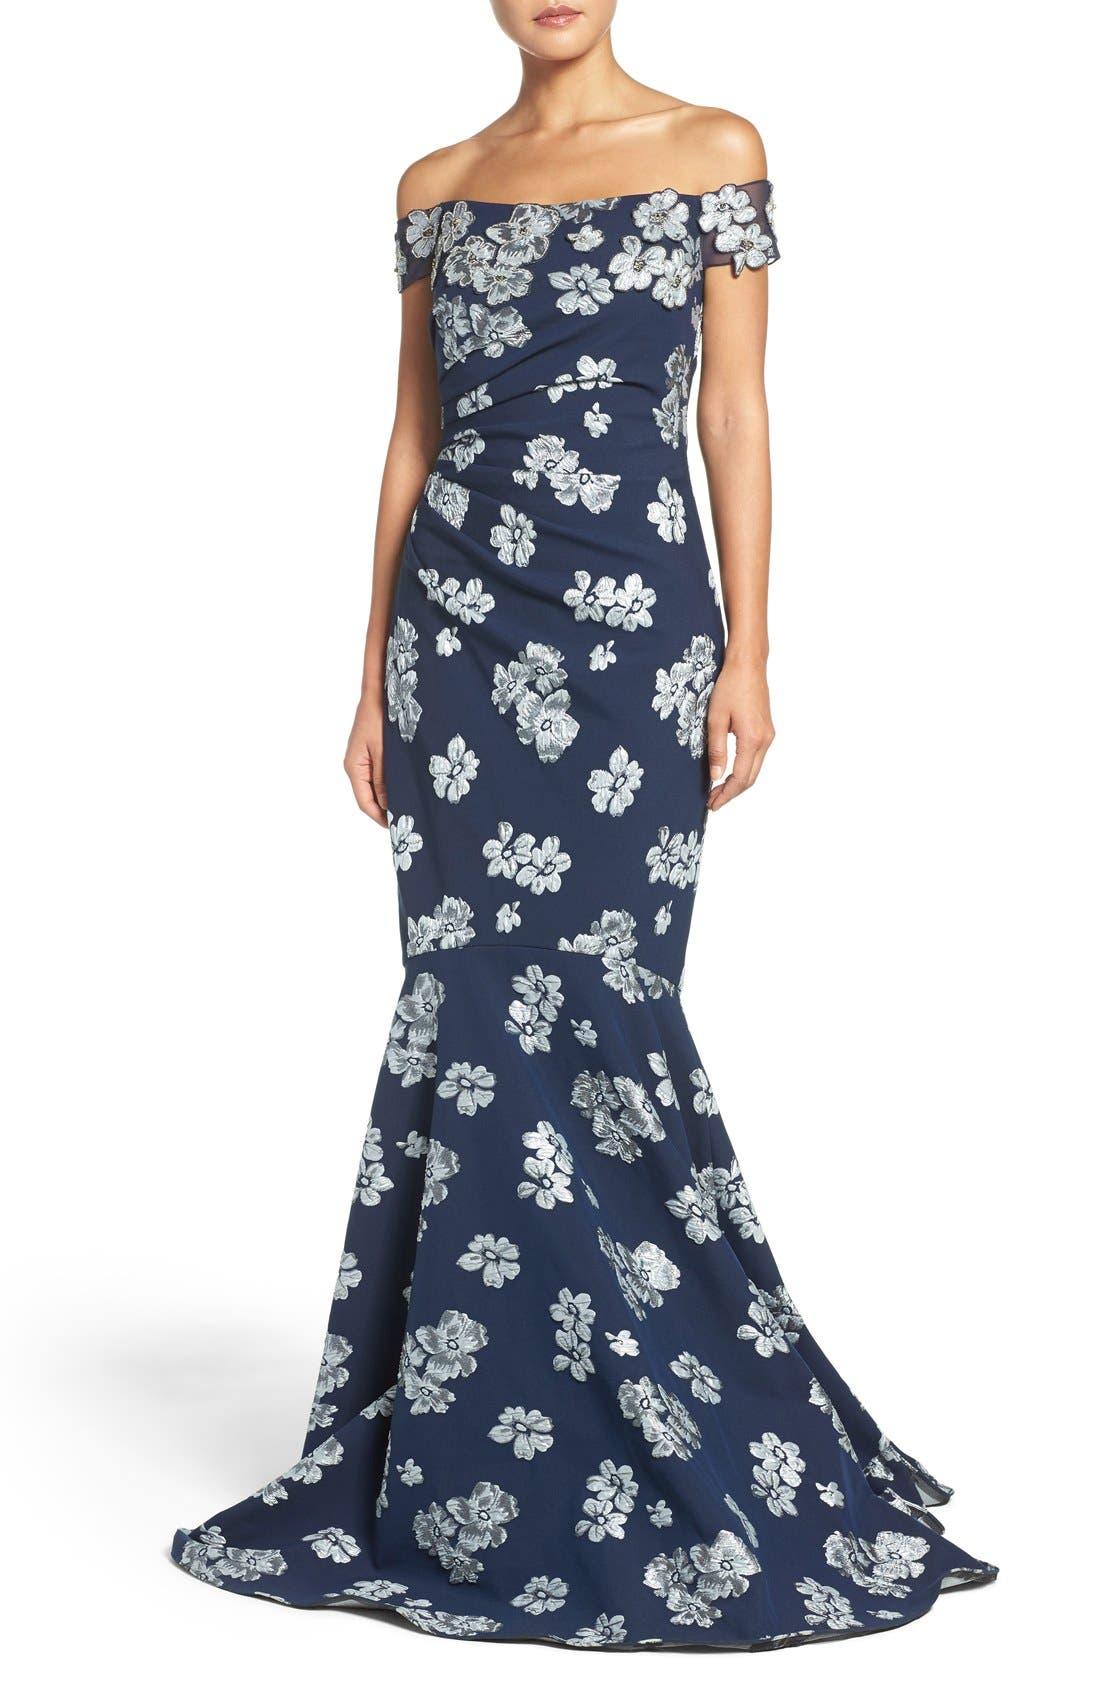 Alternate Image 1 Selected - Badgley Mischka Off the Shoulder Floral Mermaid Gown